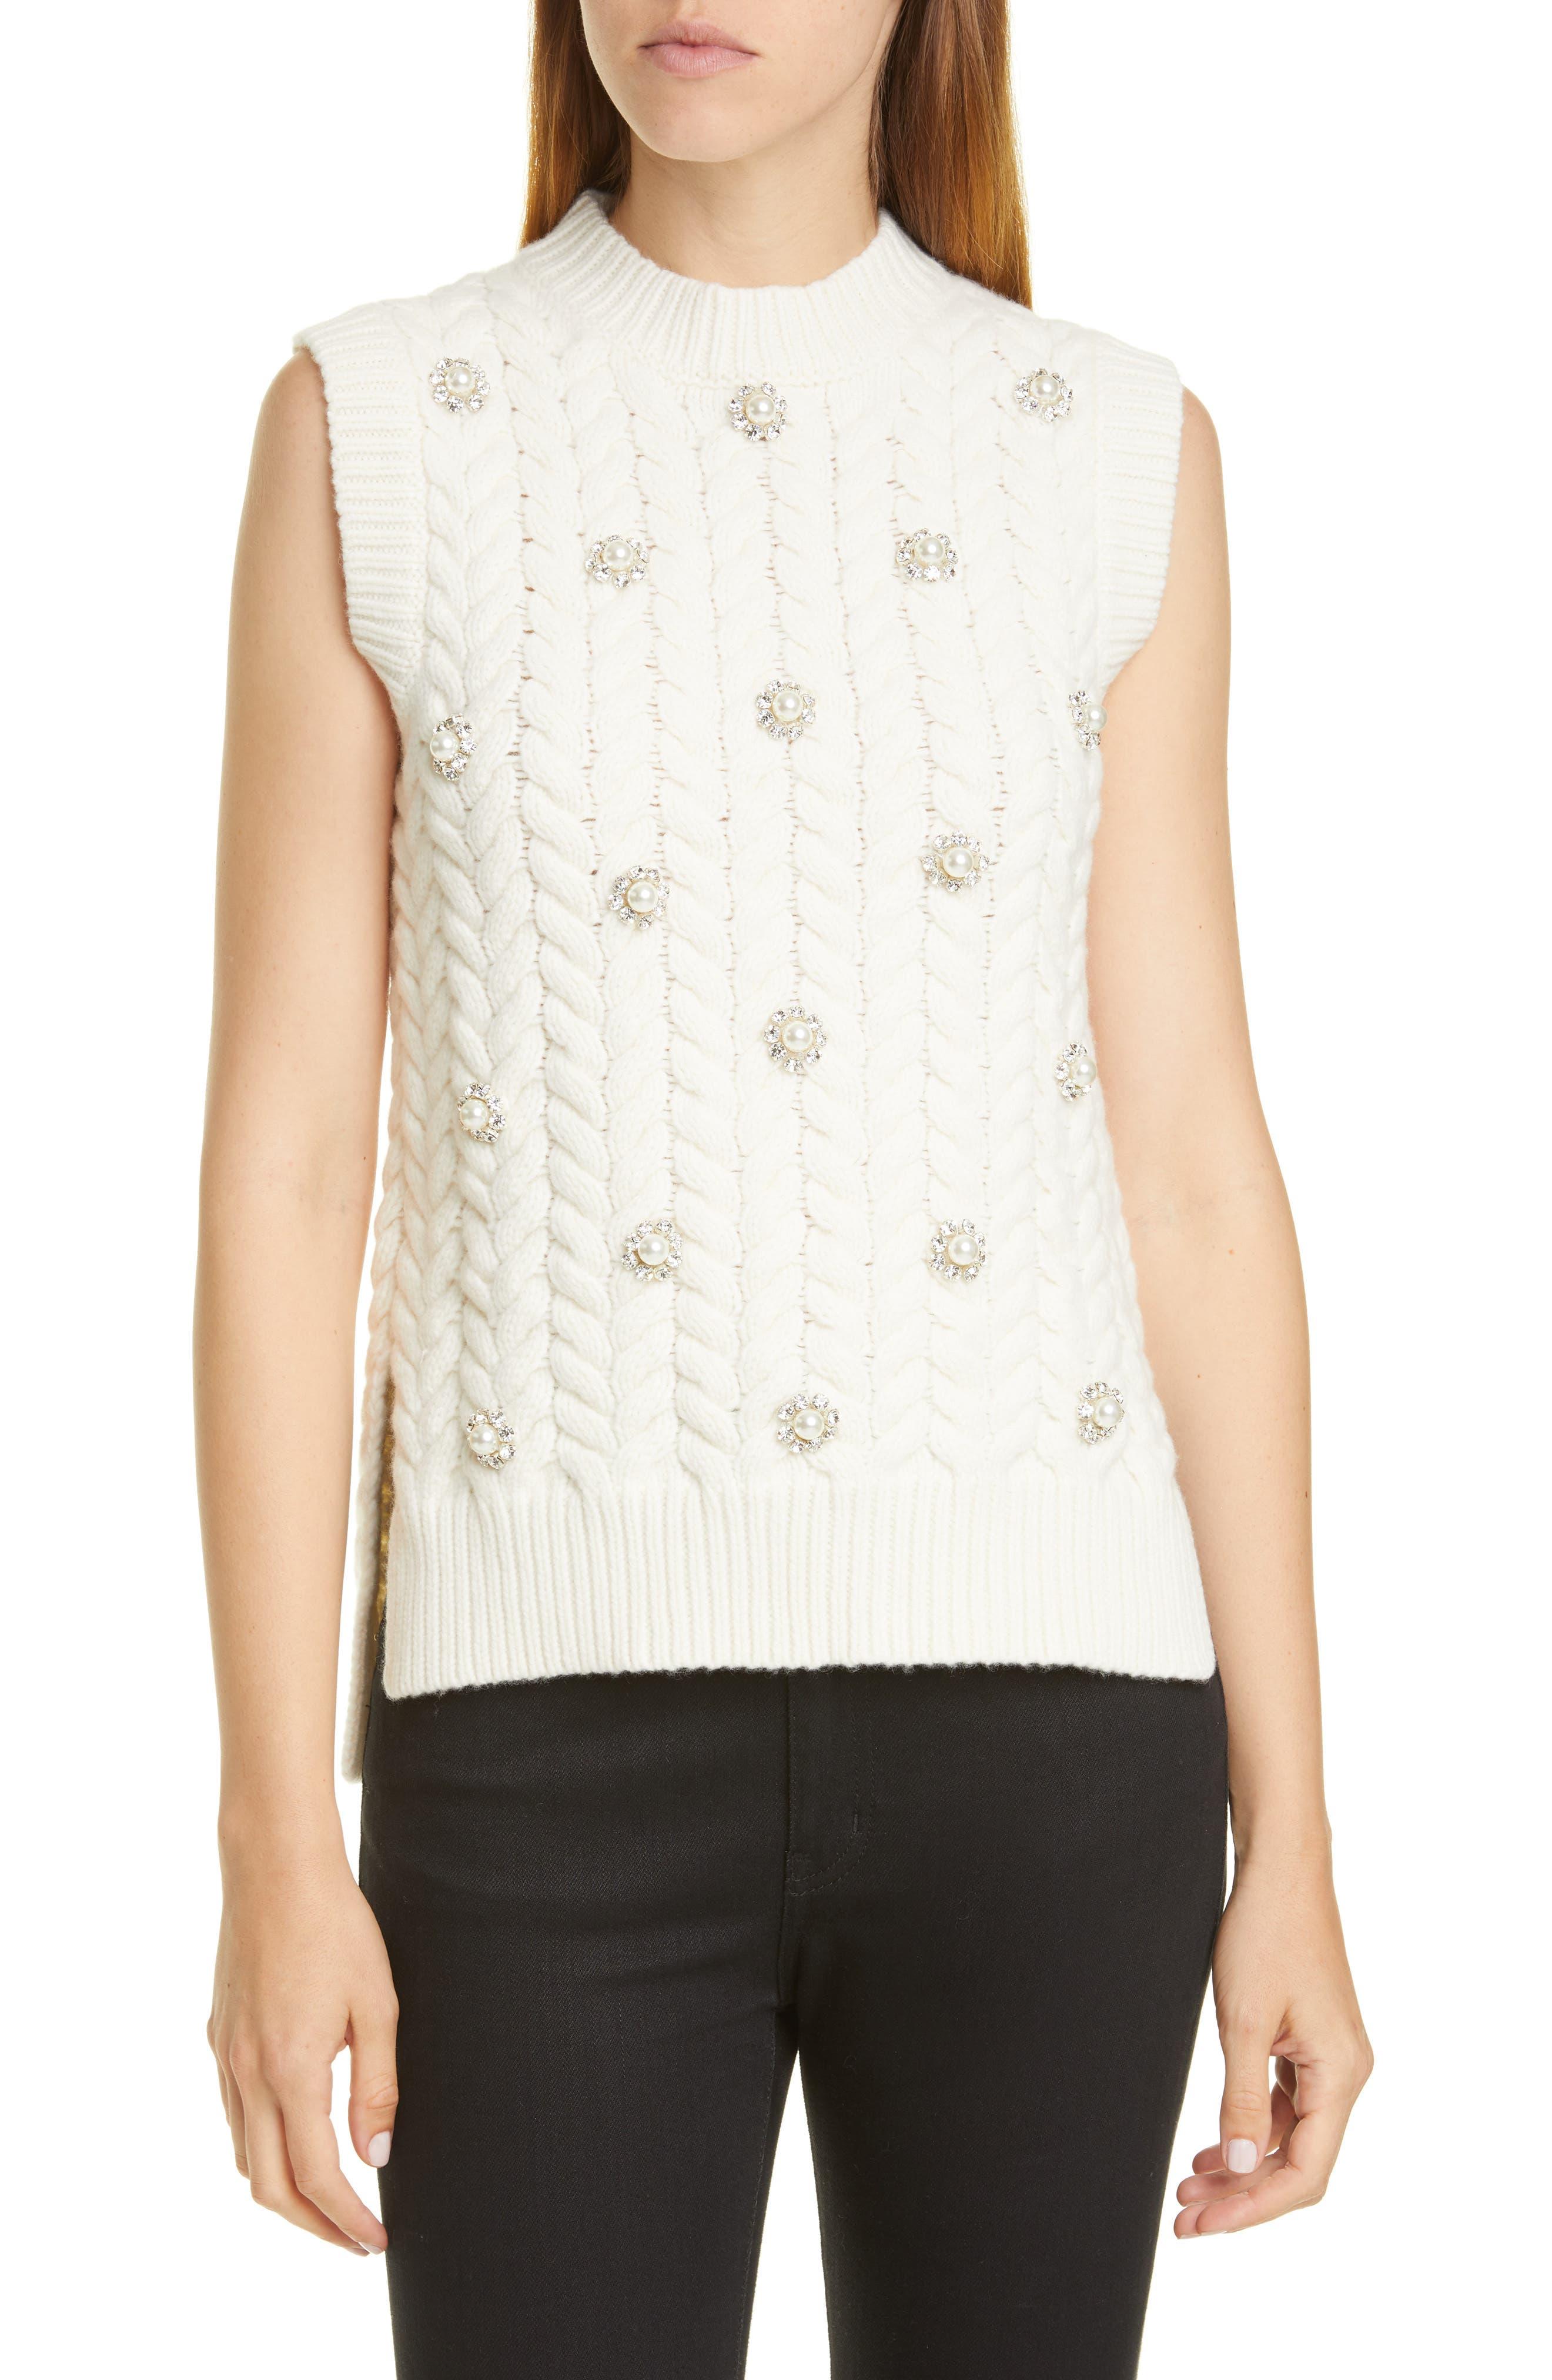 fbadbf149 Buy moncler genius by moncler clothing for women - Best women's ...